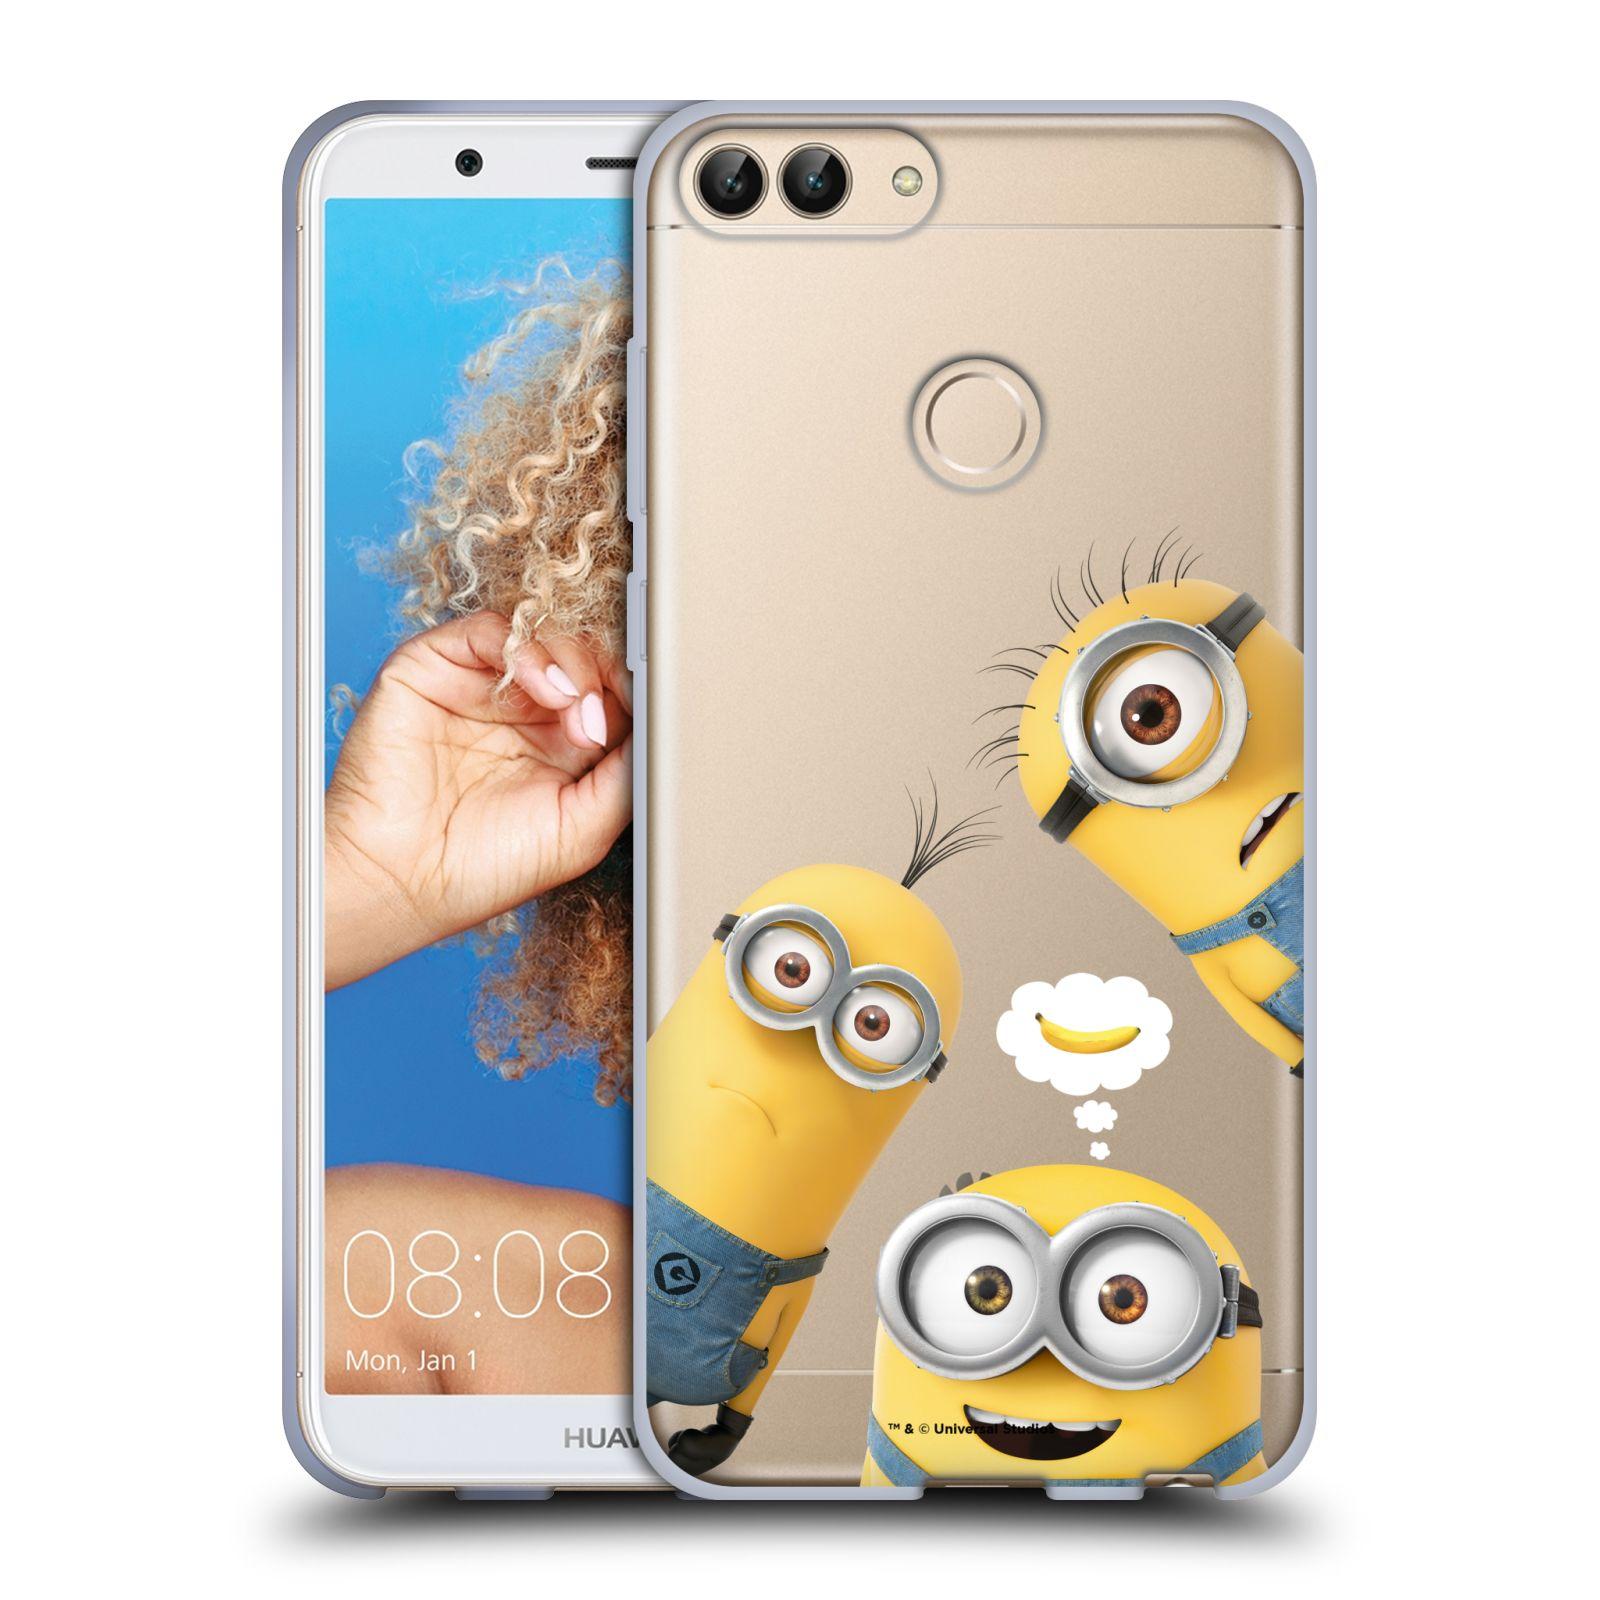 Silikonové pouzdro na mobil Huawei P Smart - Head Case - Mimoni Banana z filmu Já, padouch - Despicable Me